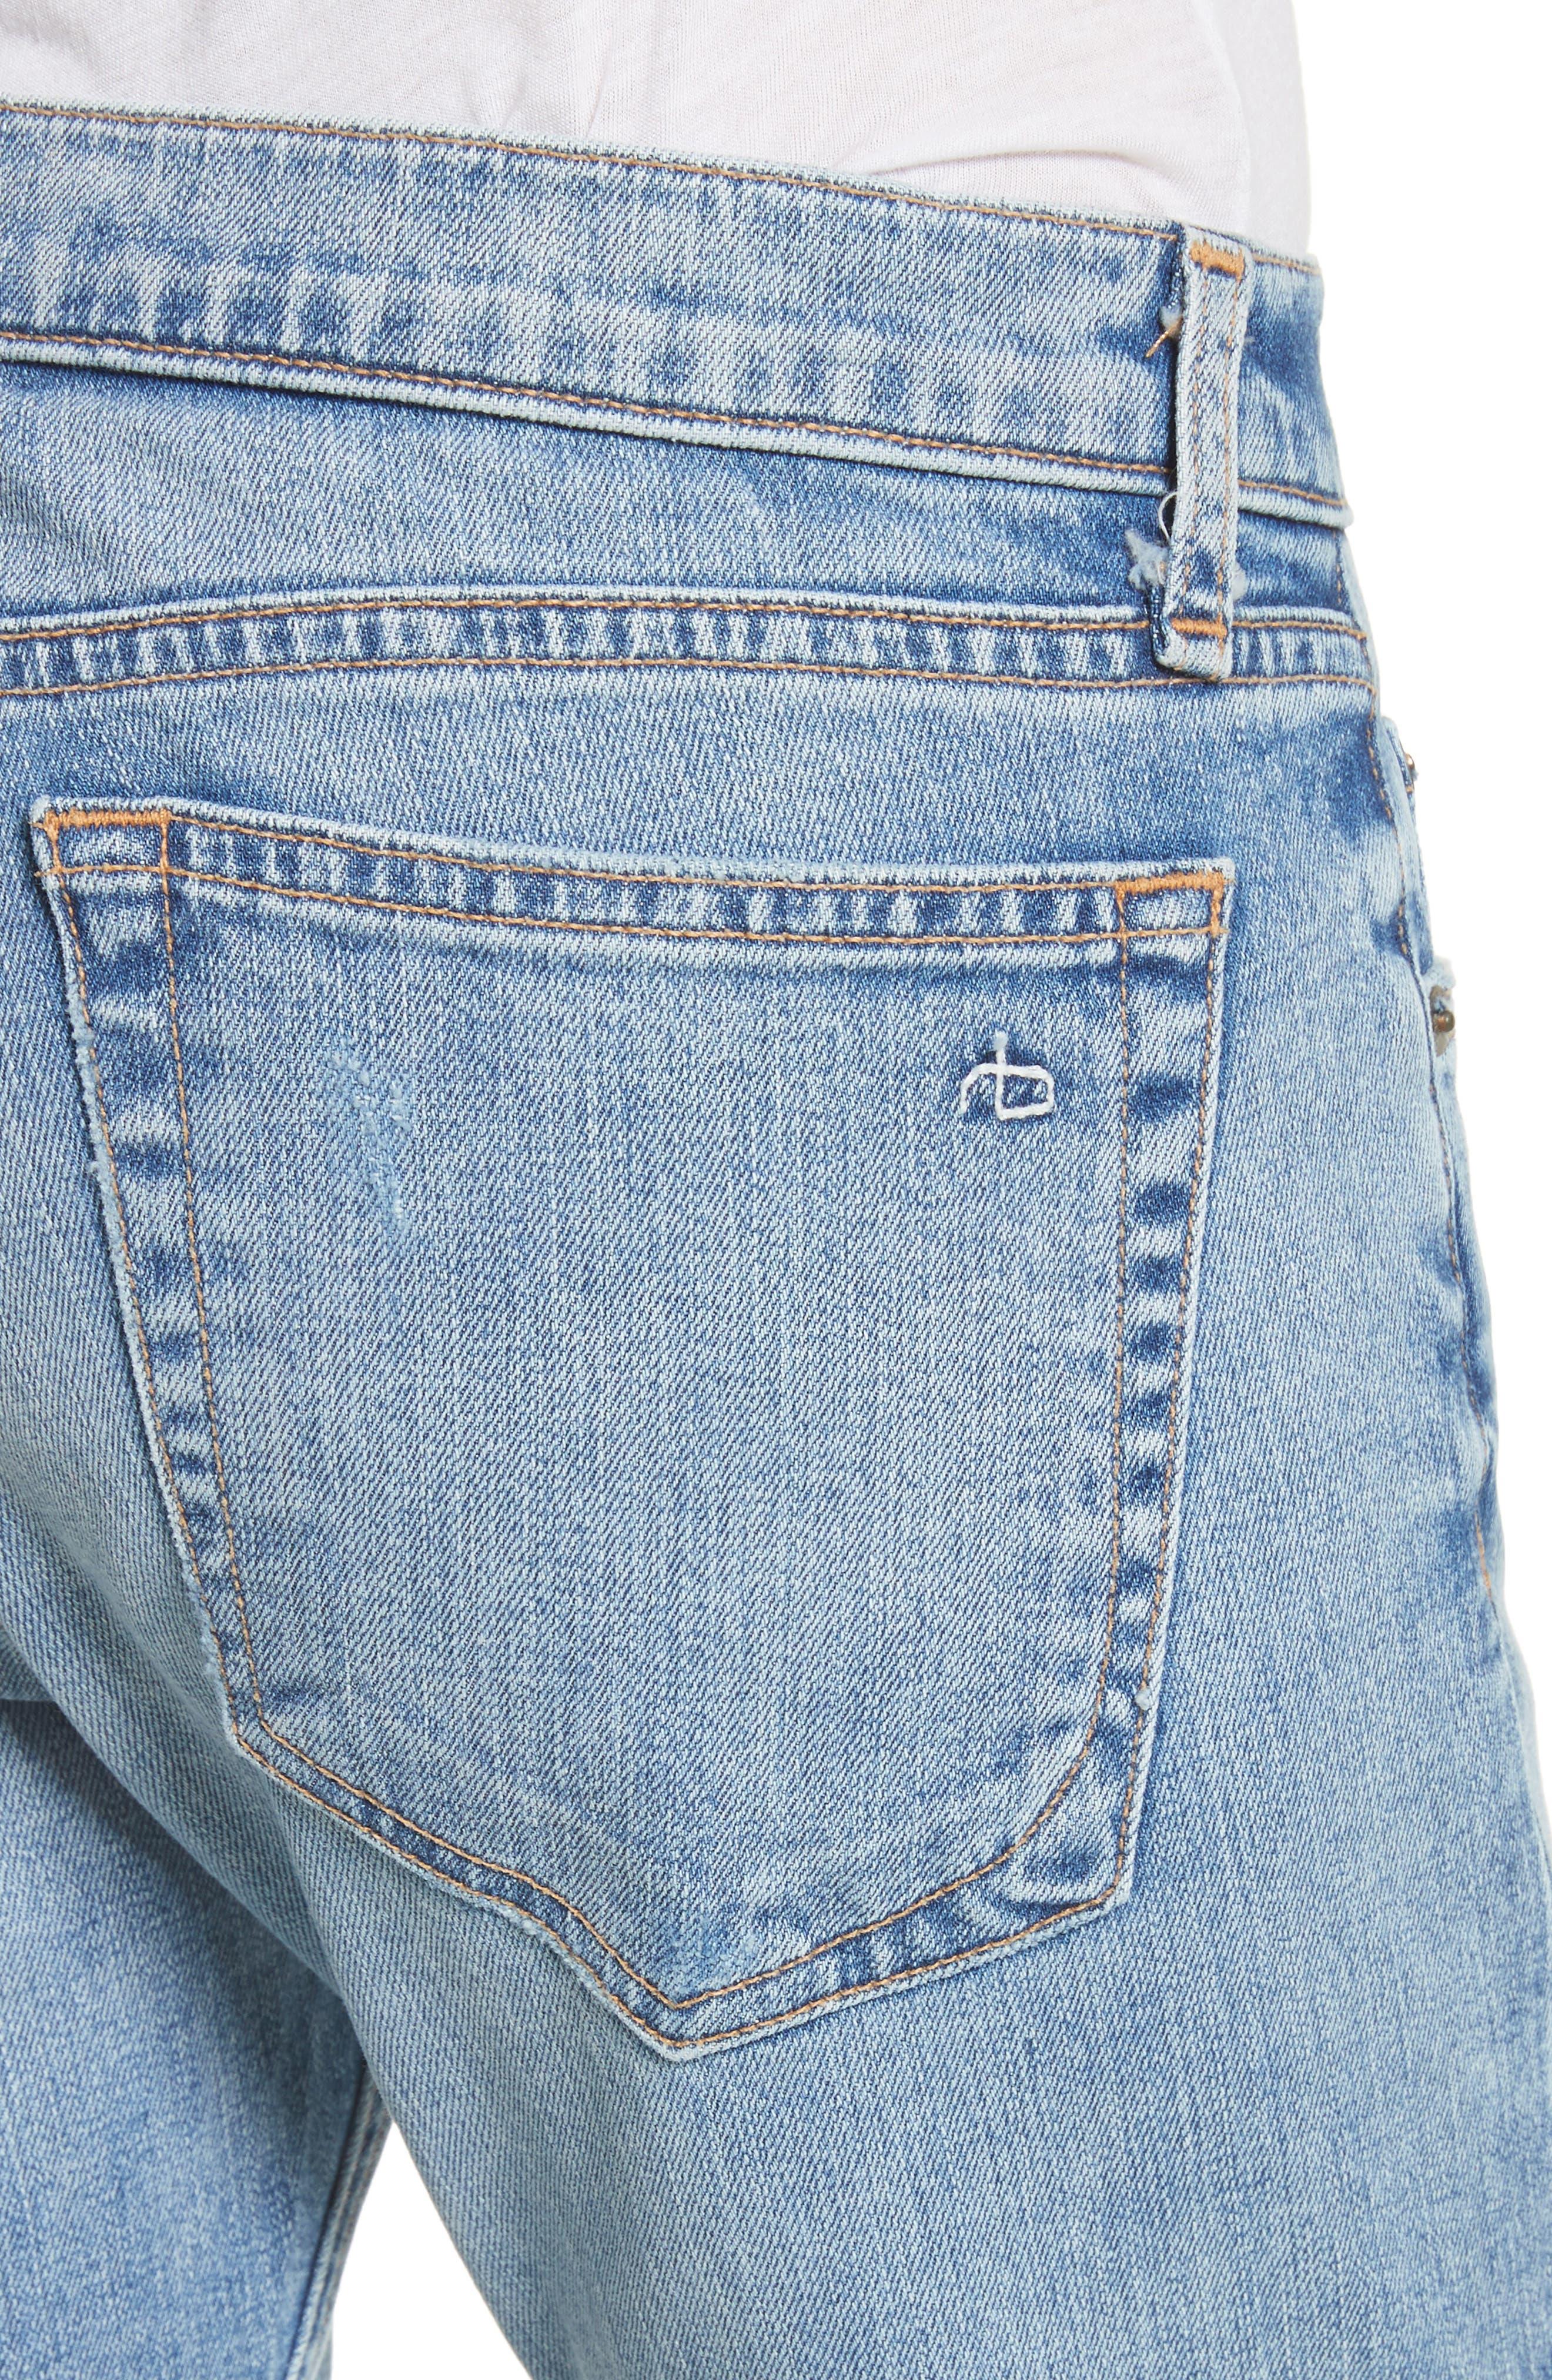 Alternate Image 4  - rag & bone/JEAN The Dre Ankle Slim Boyfriend Jeans (Alphaville)